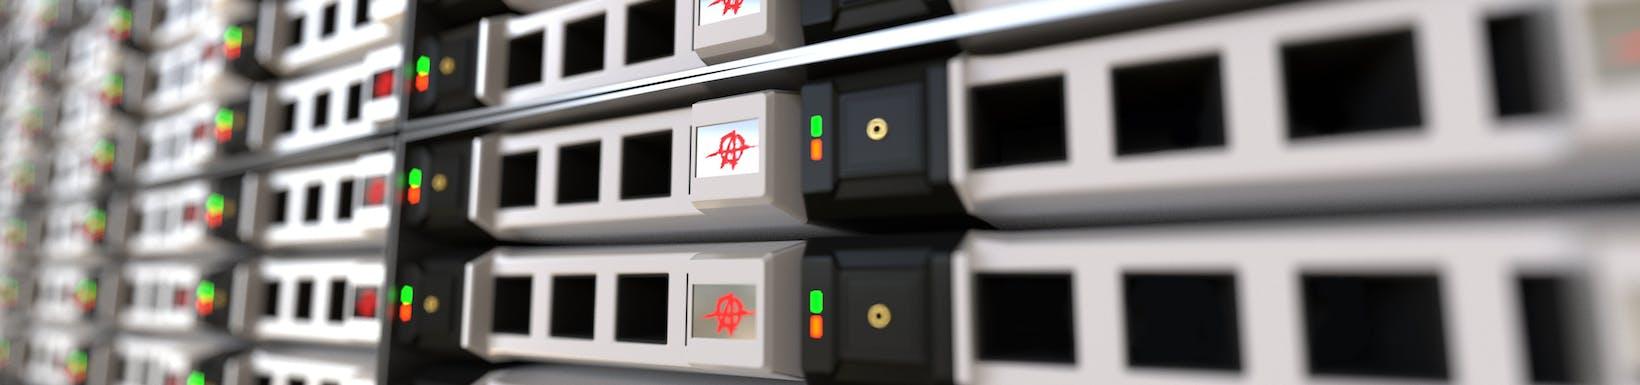 Serwery w data center, infrastruktura techniczna data center